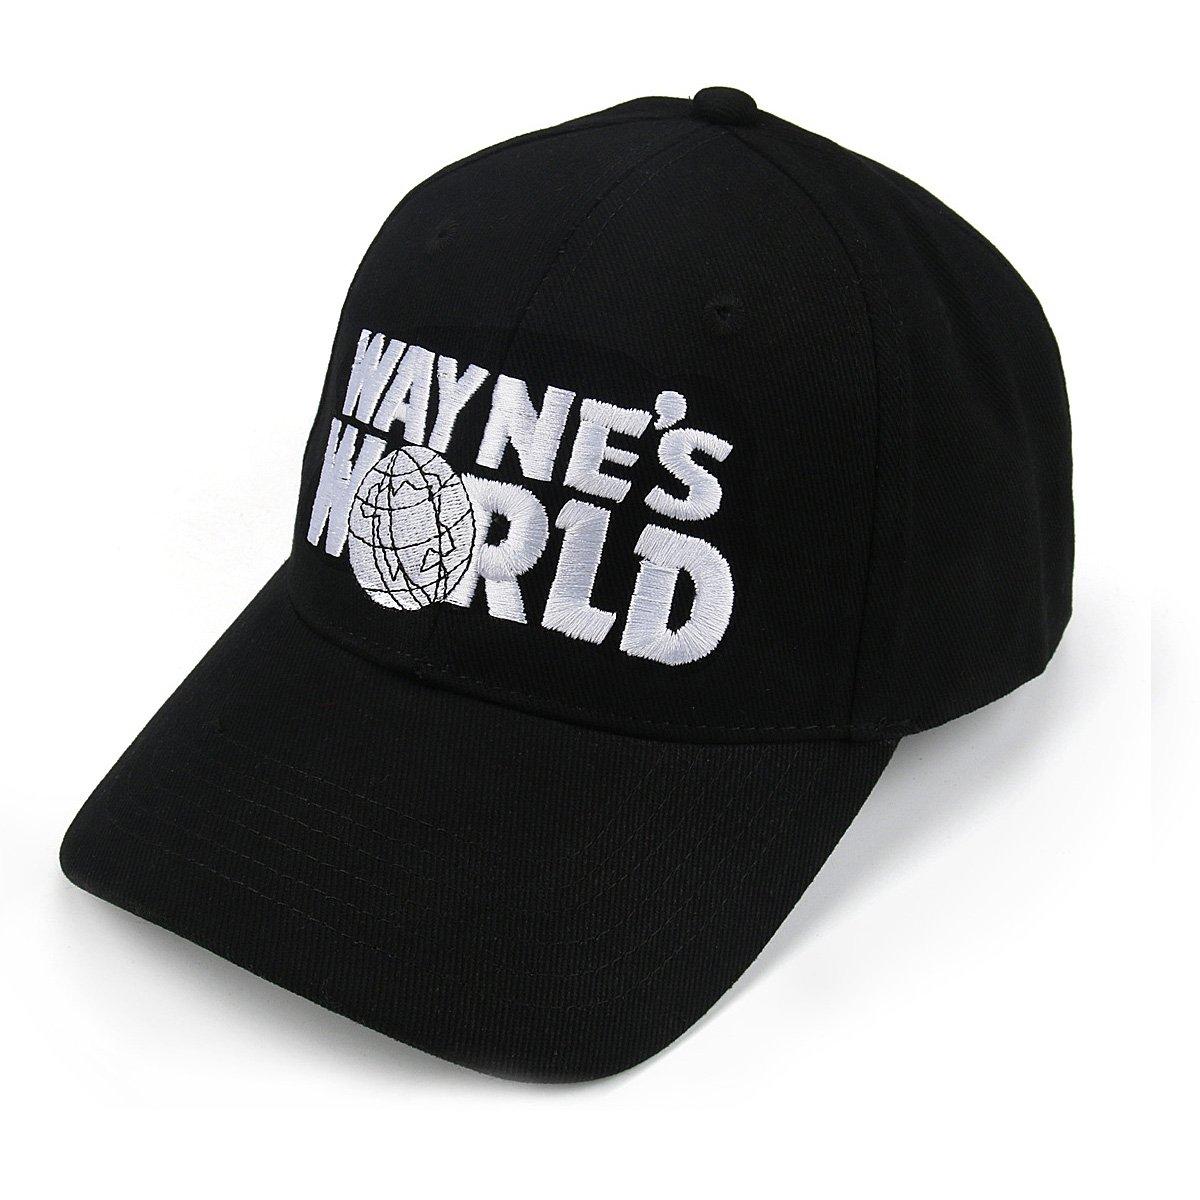 Nofonda Gorra de b/éisbol,Waynes World Bordado,Gorra Casual Adulto Unisex Negro